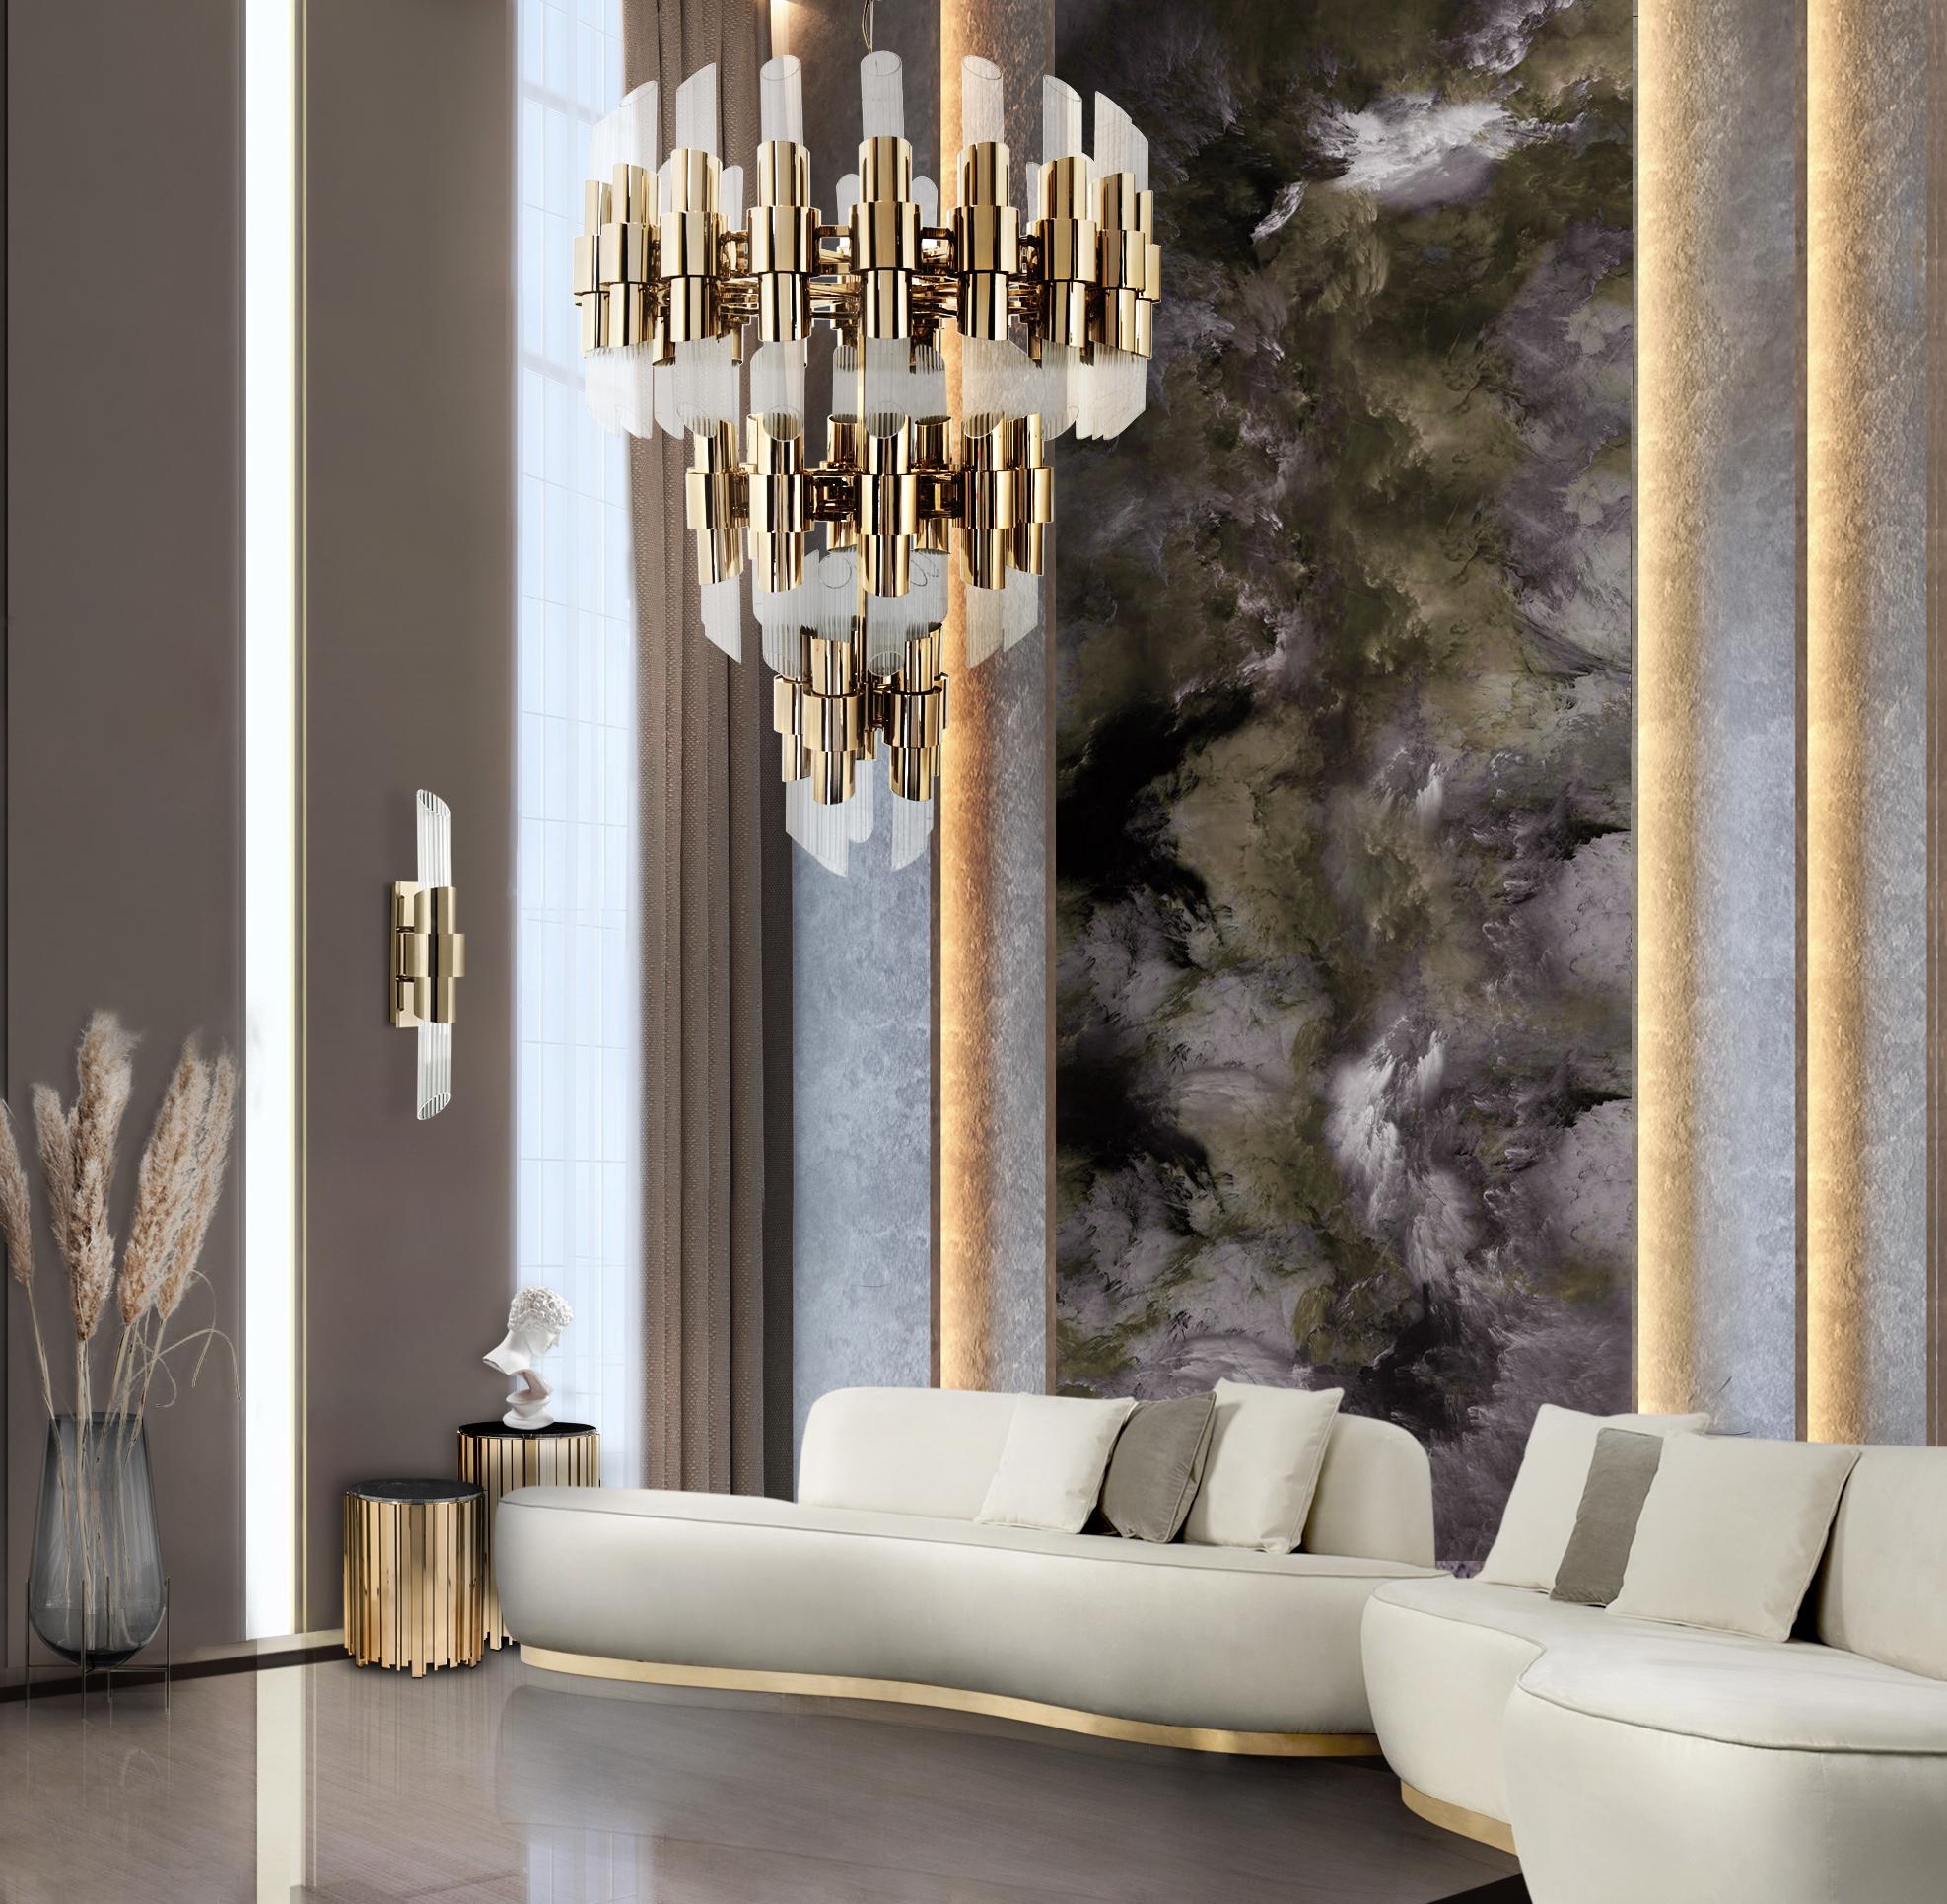 Living Room Trends: Modern Classic living room trends Living Room Trends: Modern Classic tycho chandelier 03